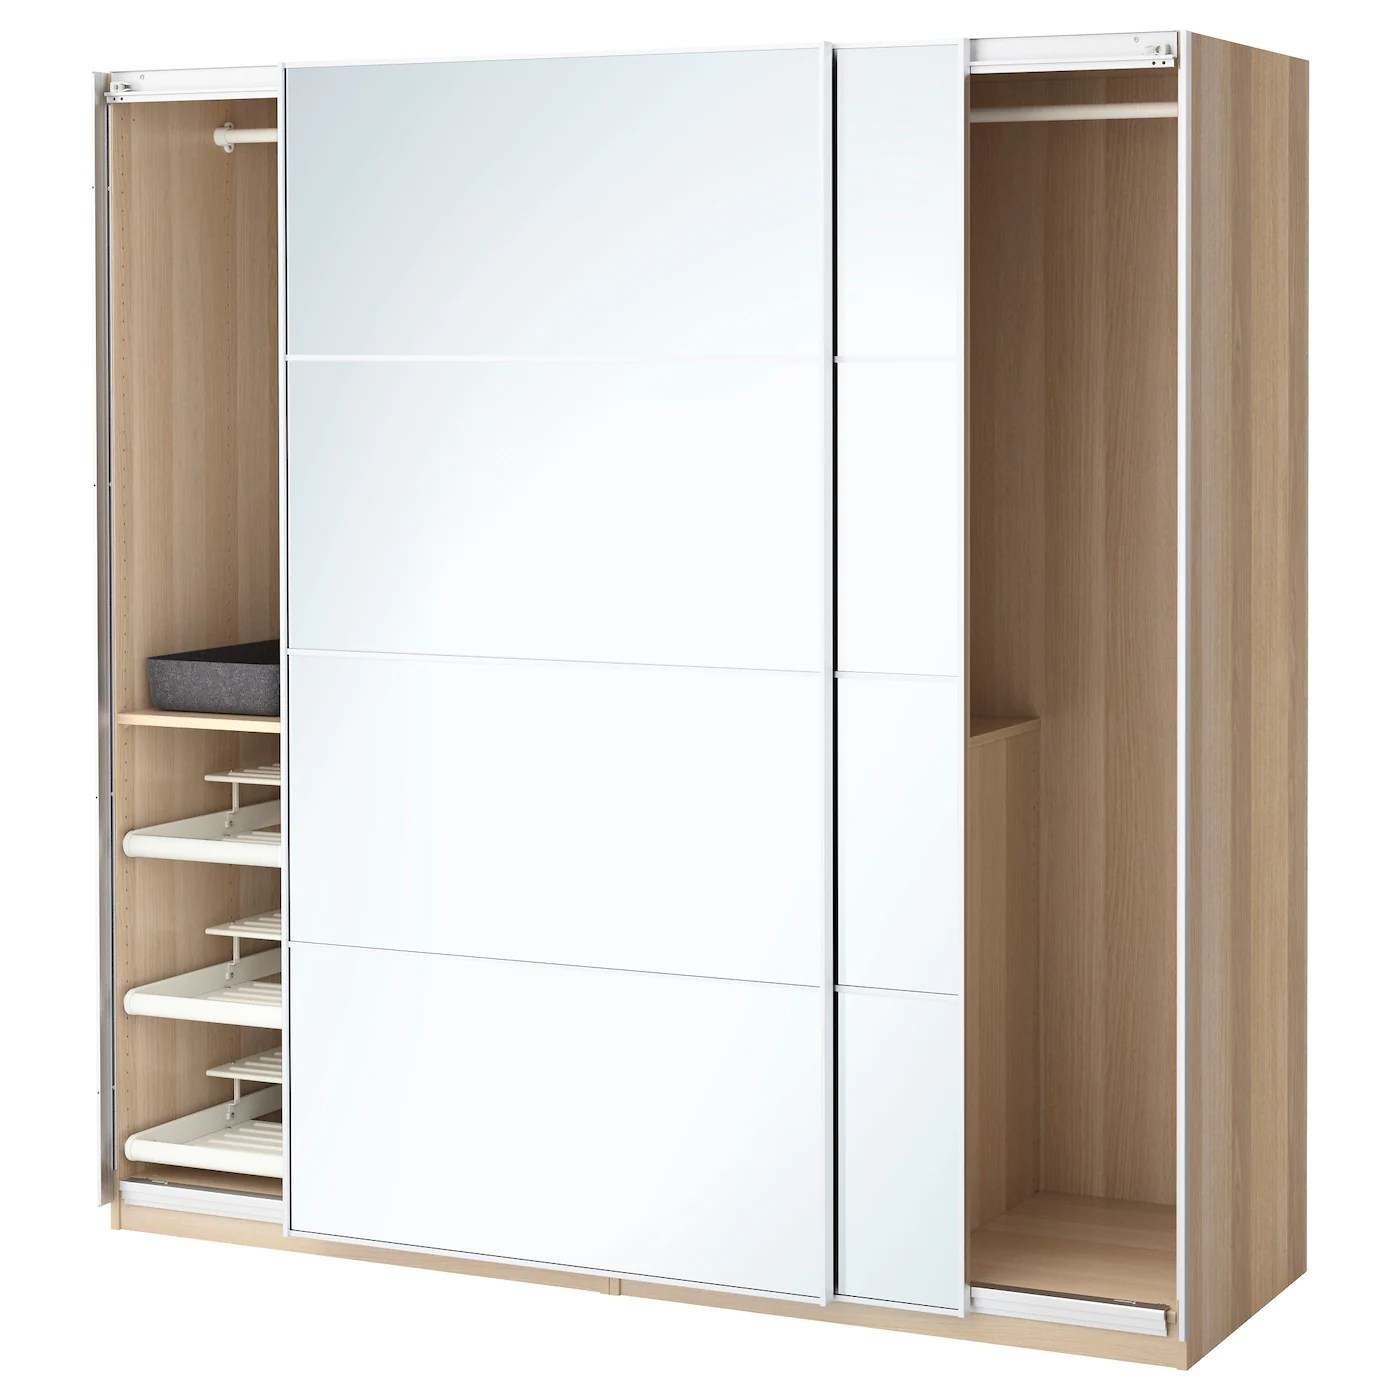 Wardrobe Combinations With Doors IKEA